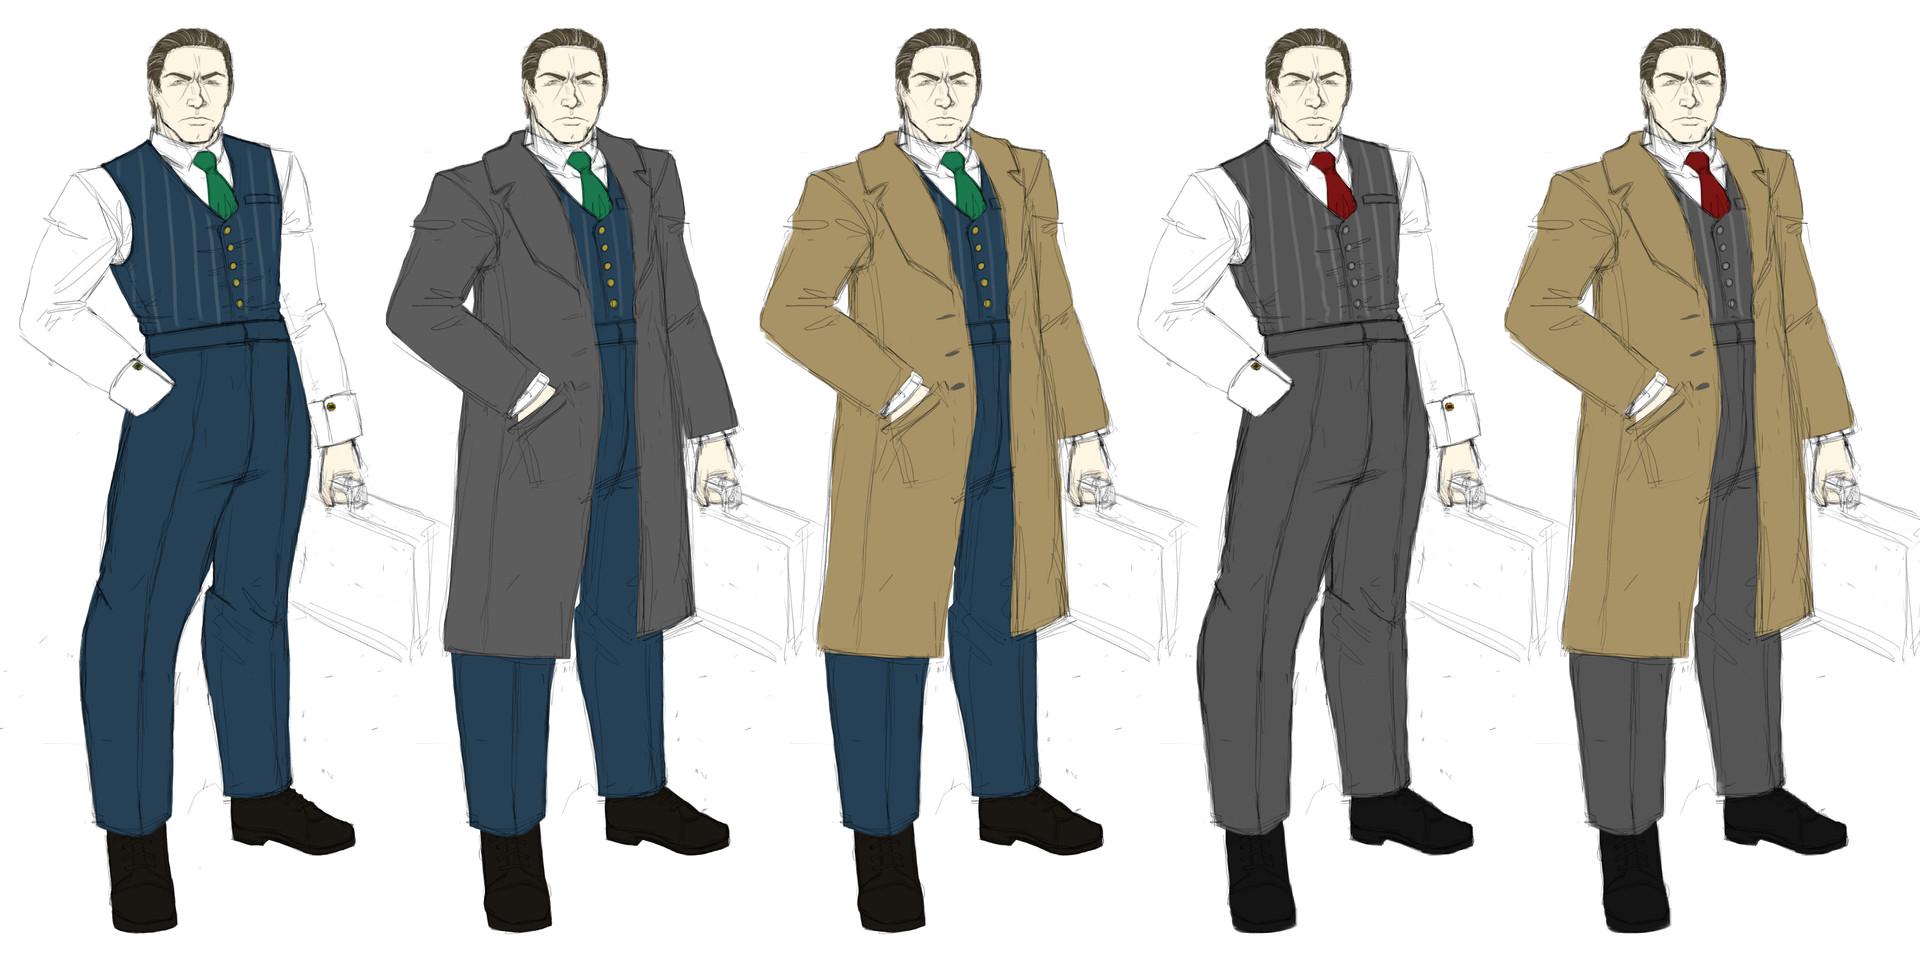 Sietske hereijgers underboss outfit 3